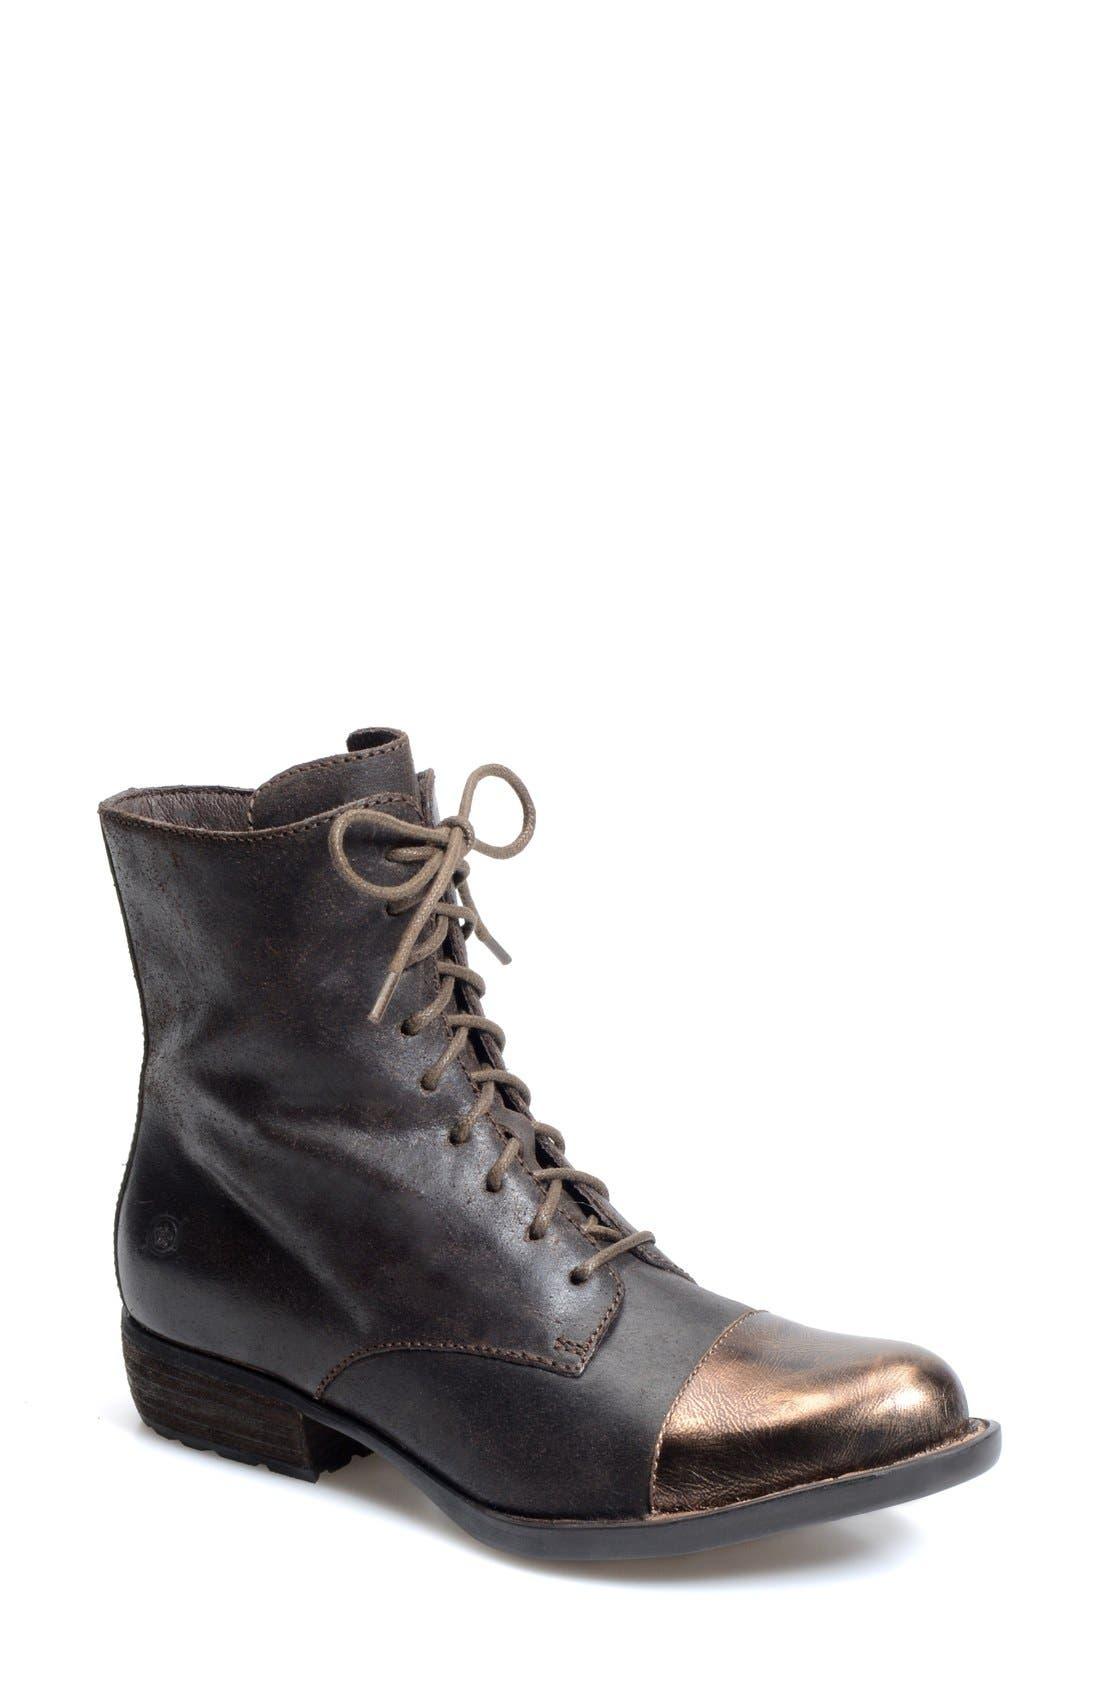 Alternate Image 1 Selected - Børn 'Lookis' Cap Toe Boot (Women)